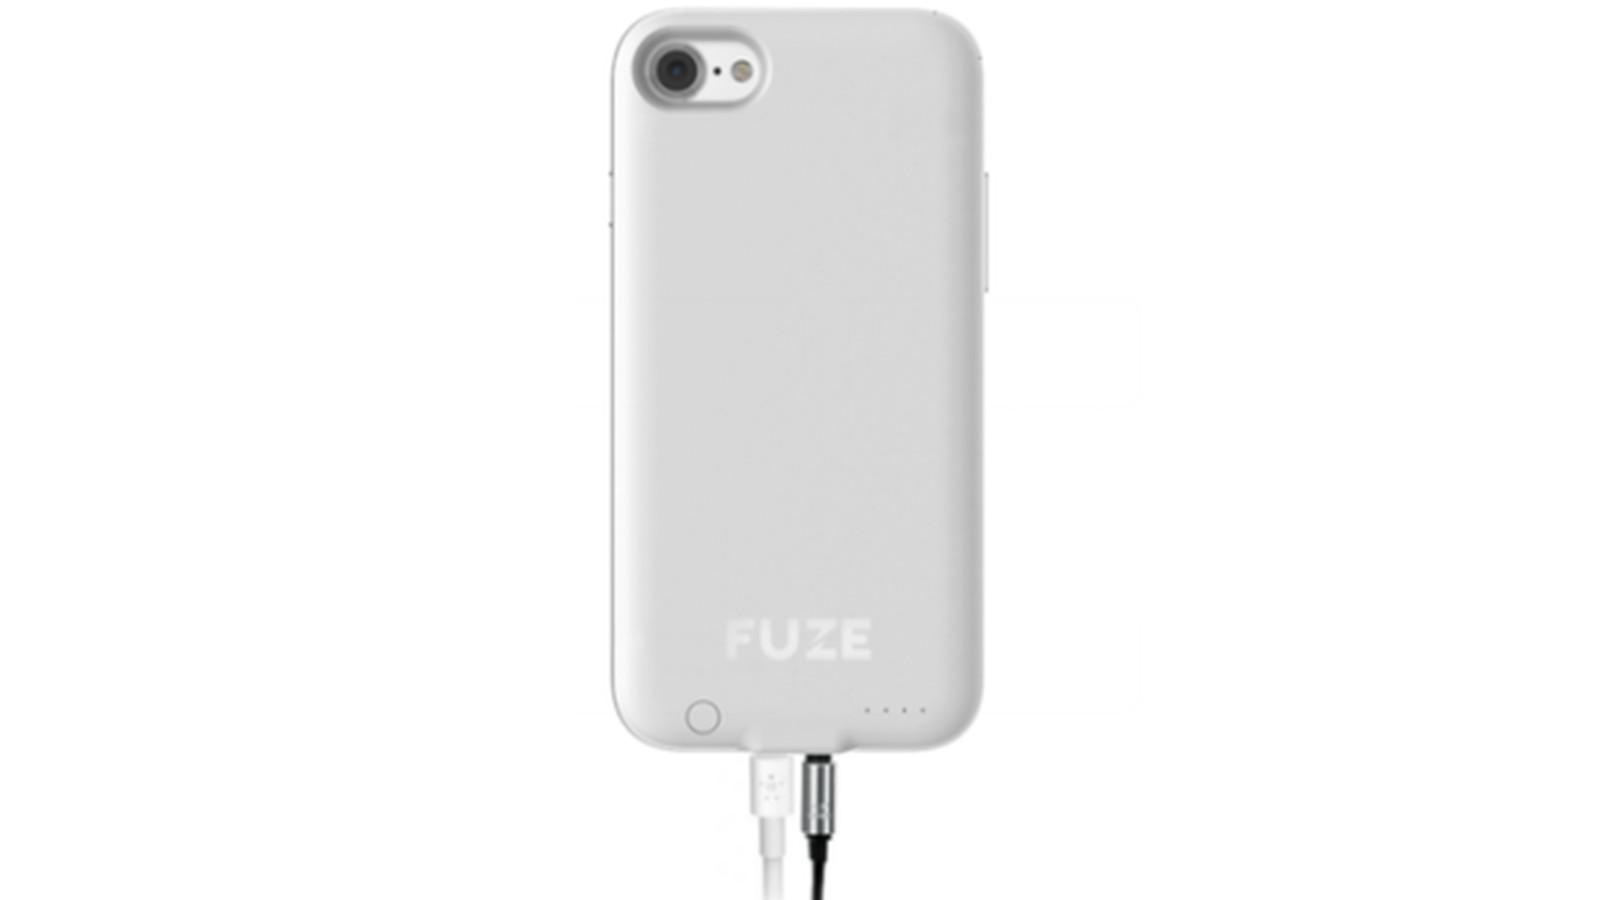 Fuze Case Iphone